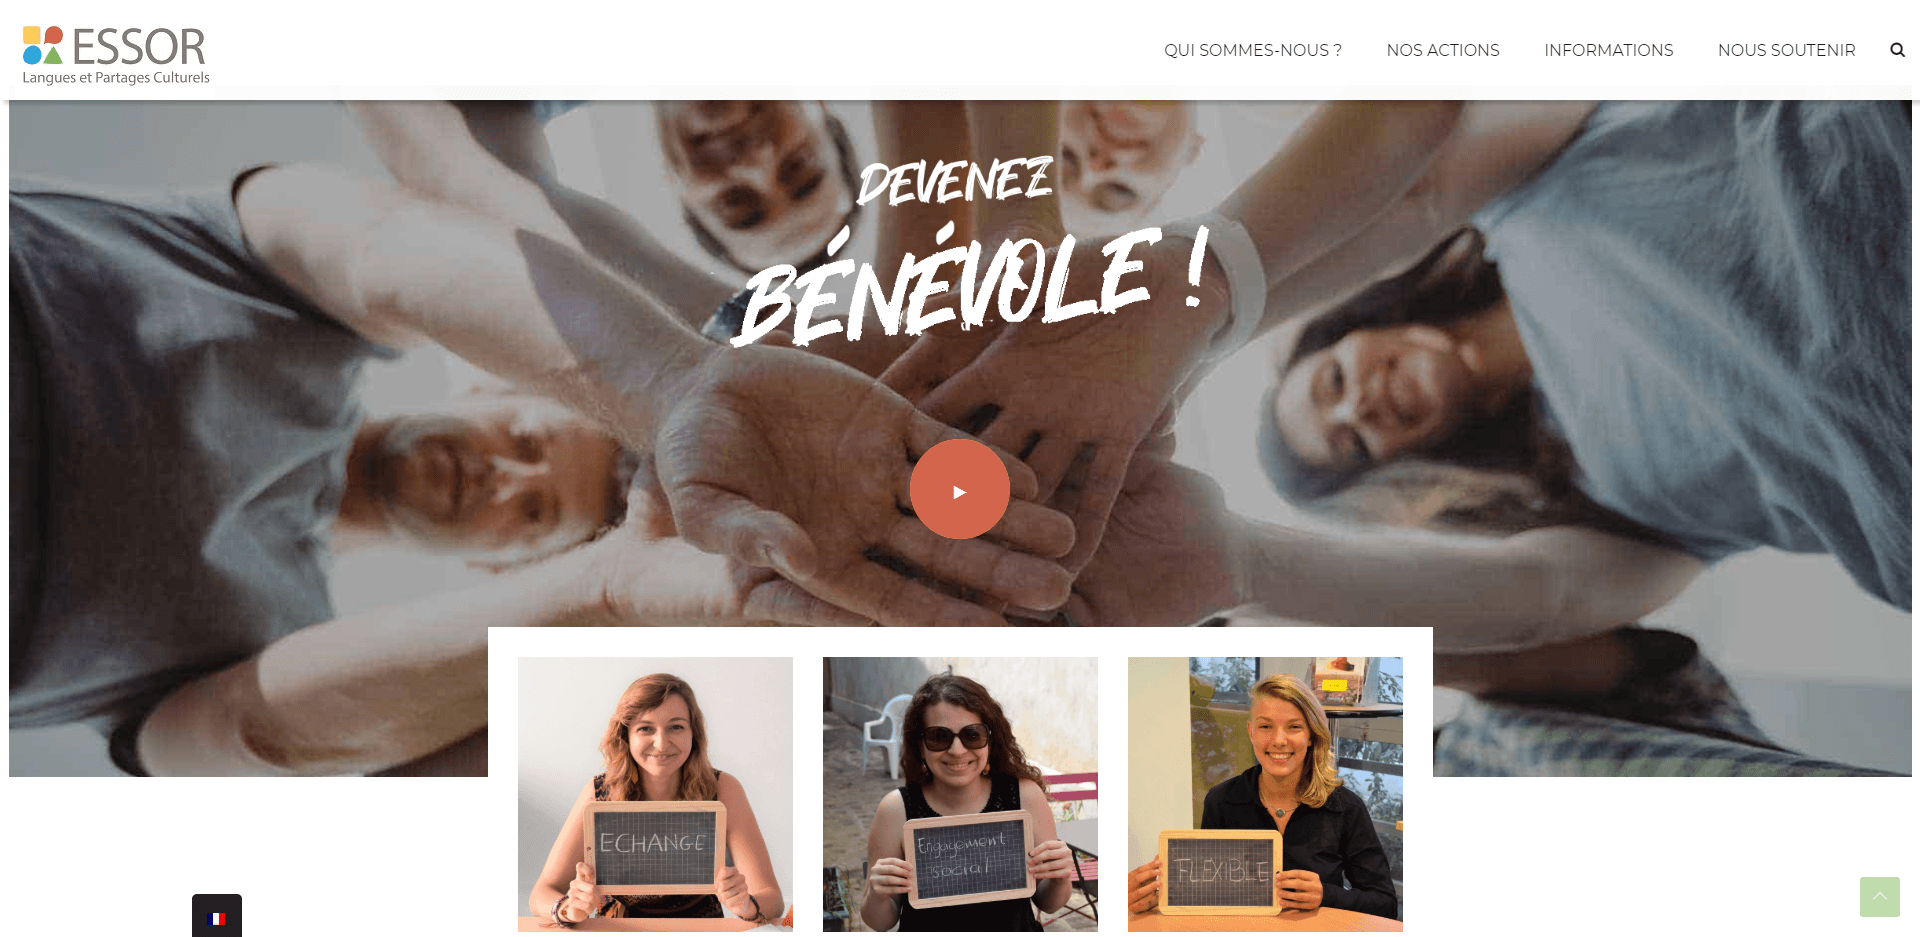 benevoles - Accueil - ESSOR Association - Langues et partages culturels_ - association-essor.org